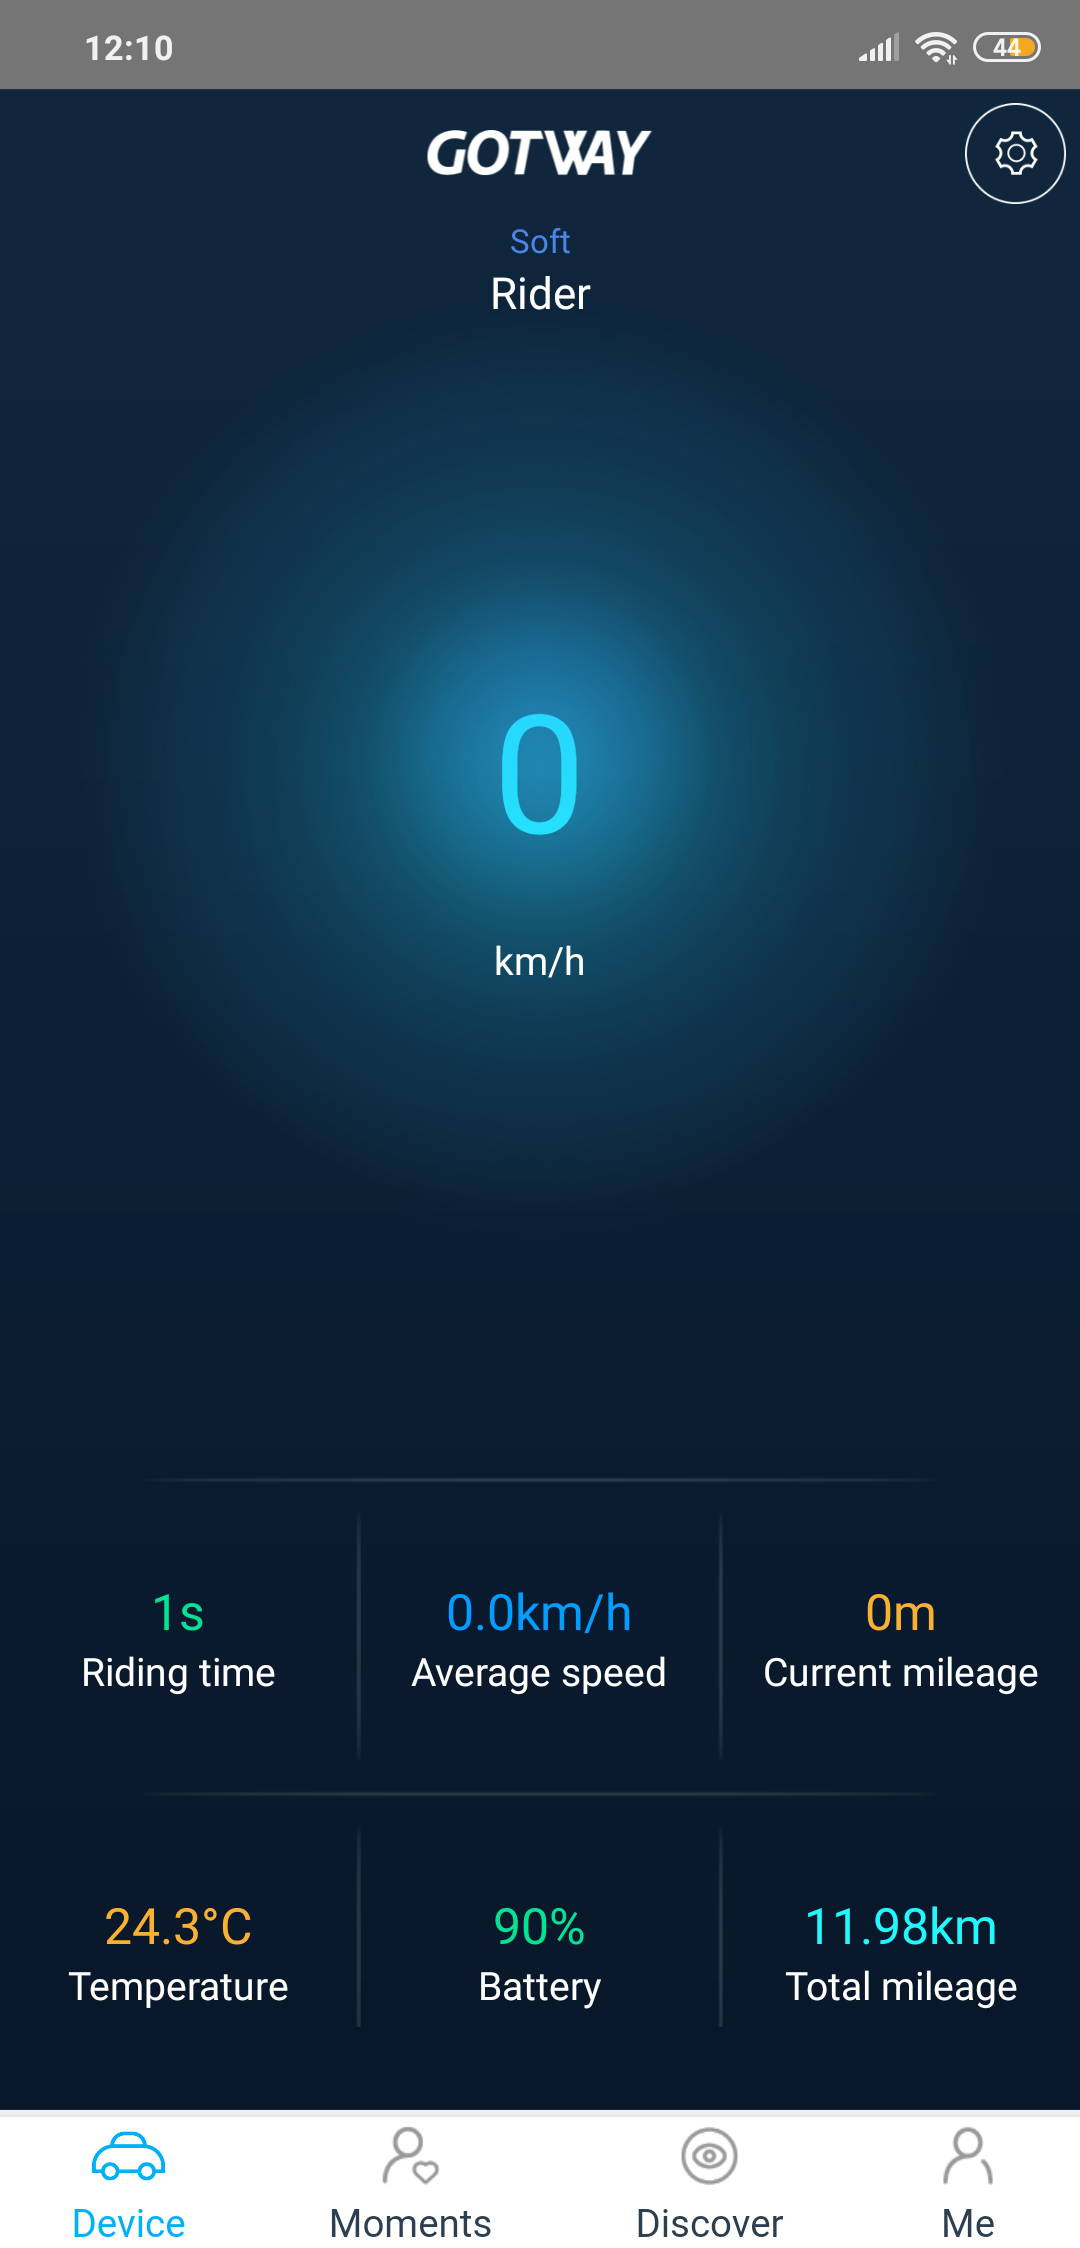 Gotway App